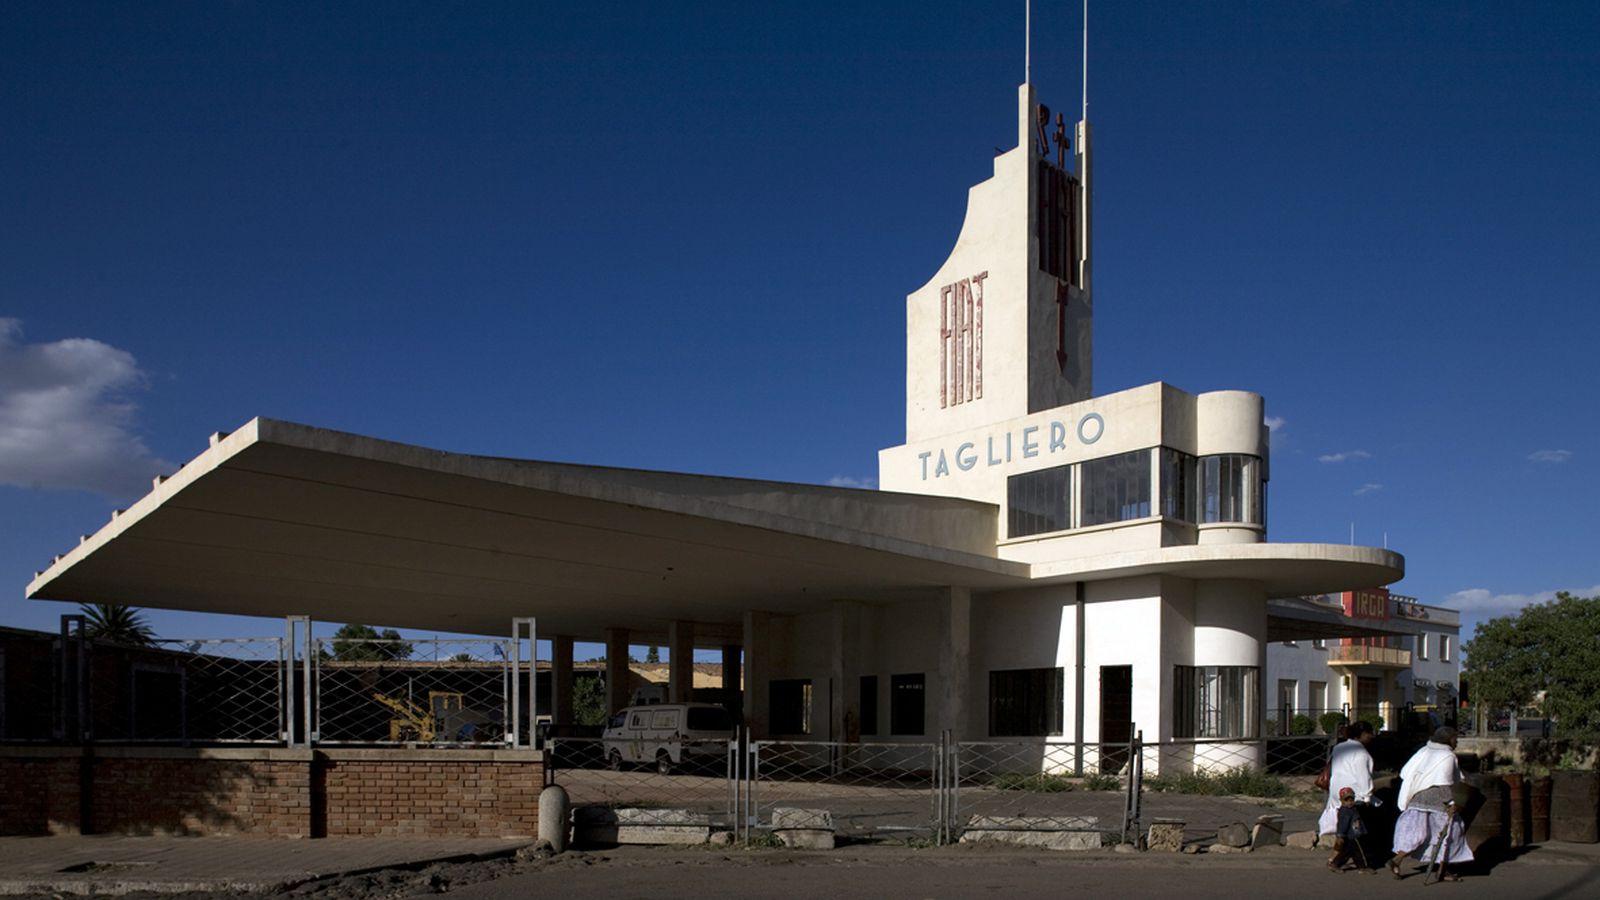 asmara architecture modernism fiat tagliero africa mussolini modern modernist eritrea italian station